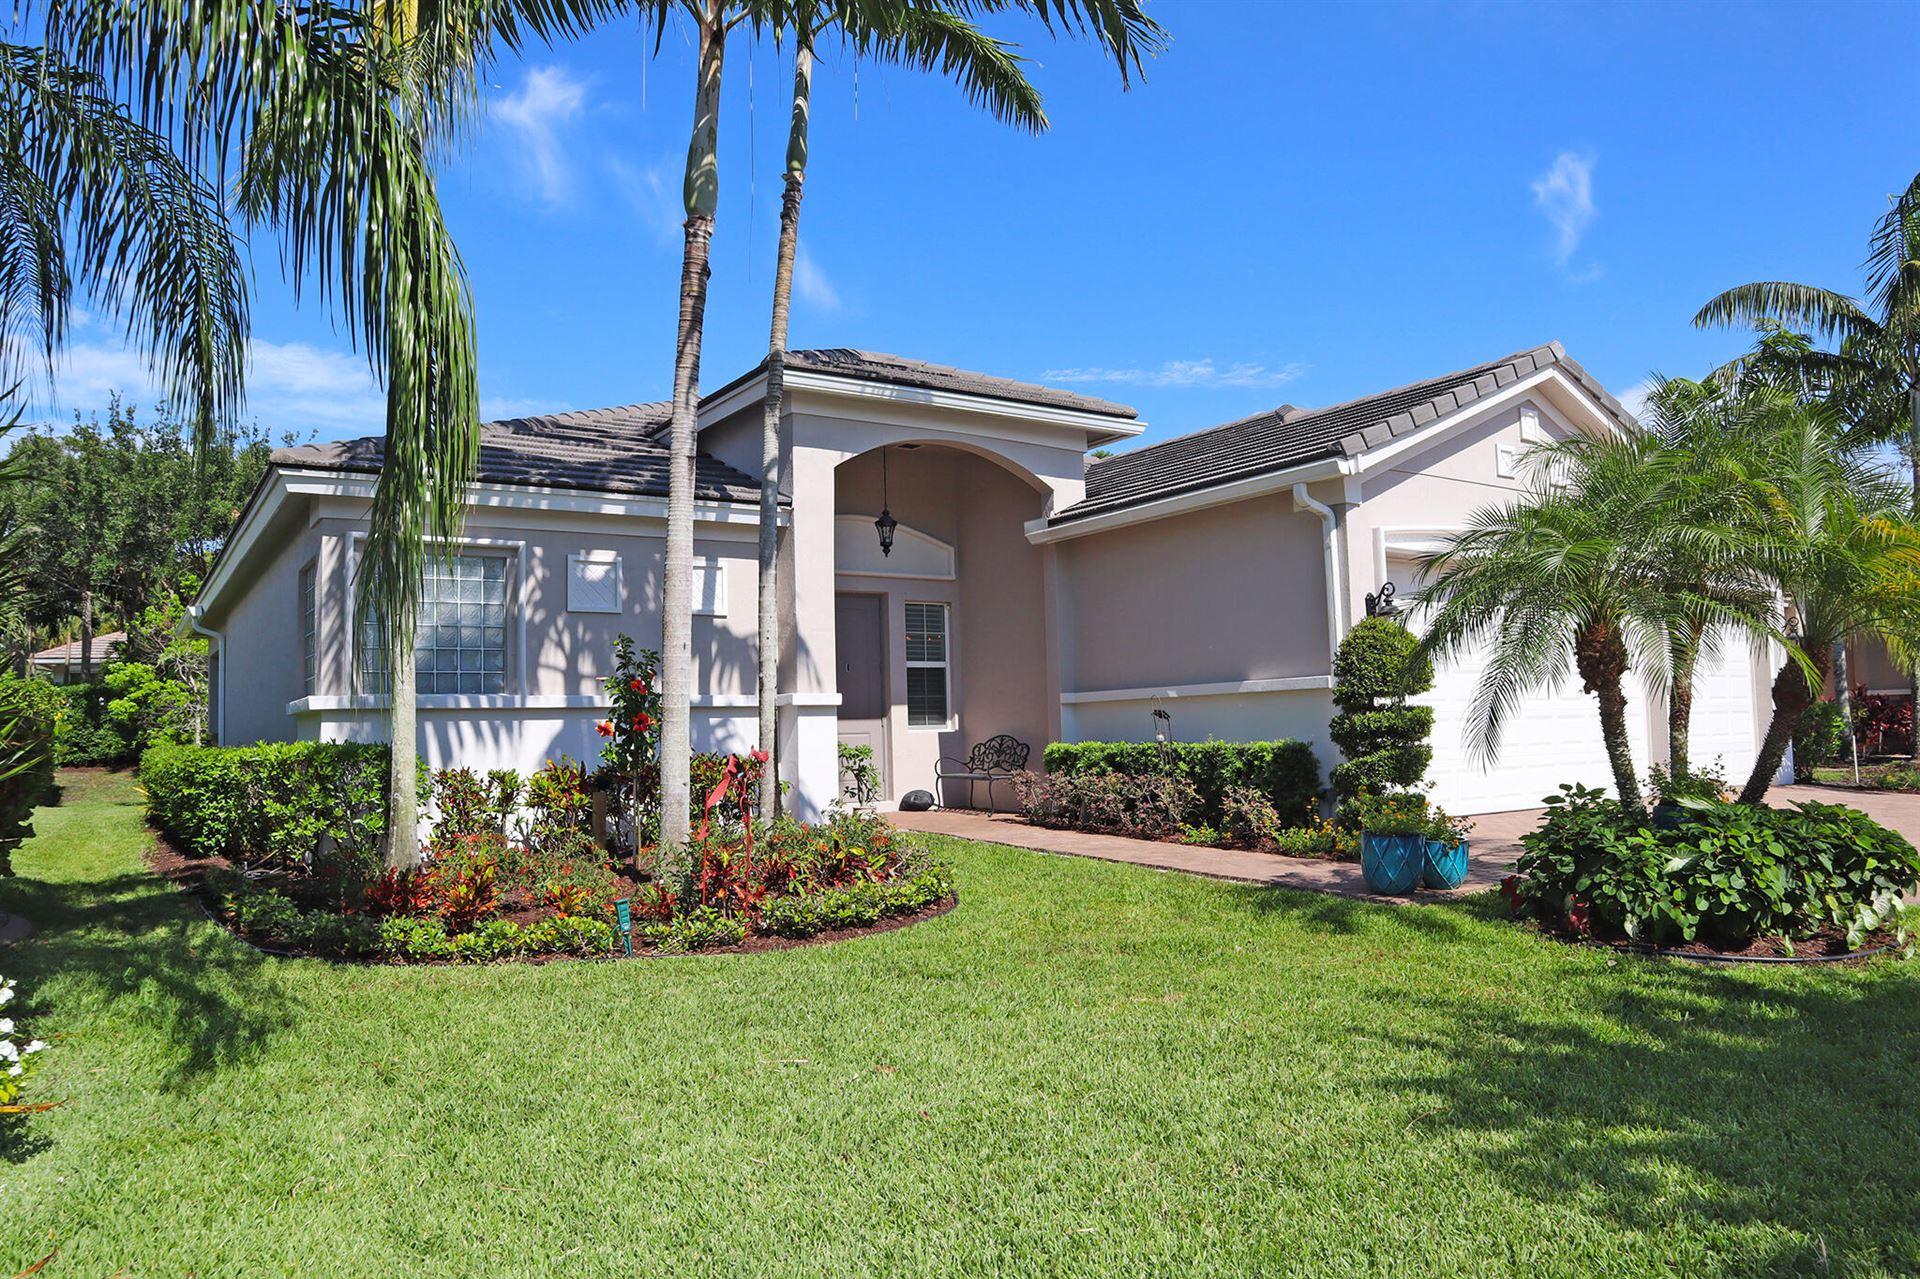 8357 Butler Greenwood Drive, Royal Palm Beach, FL 33411 - MLS#: RX-10719887